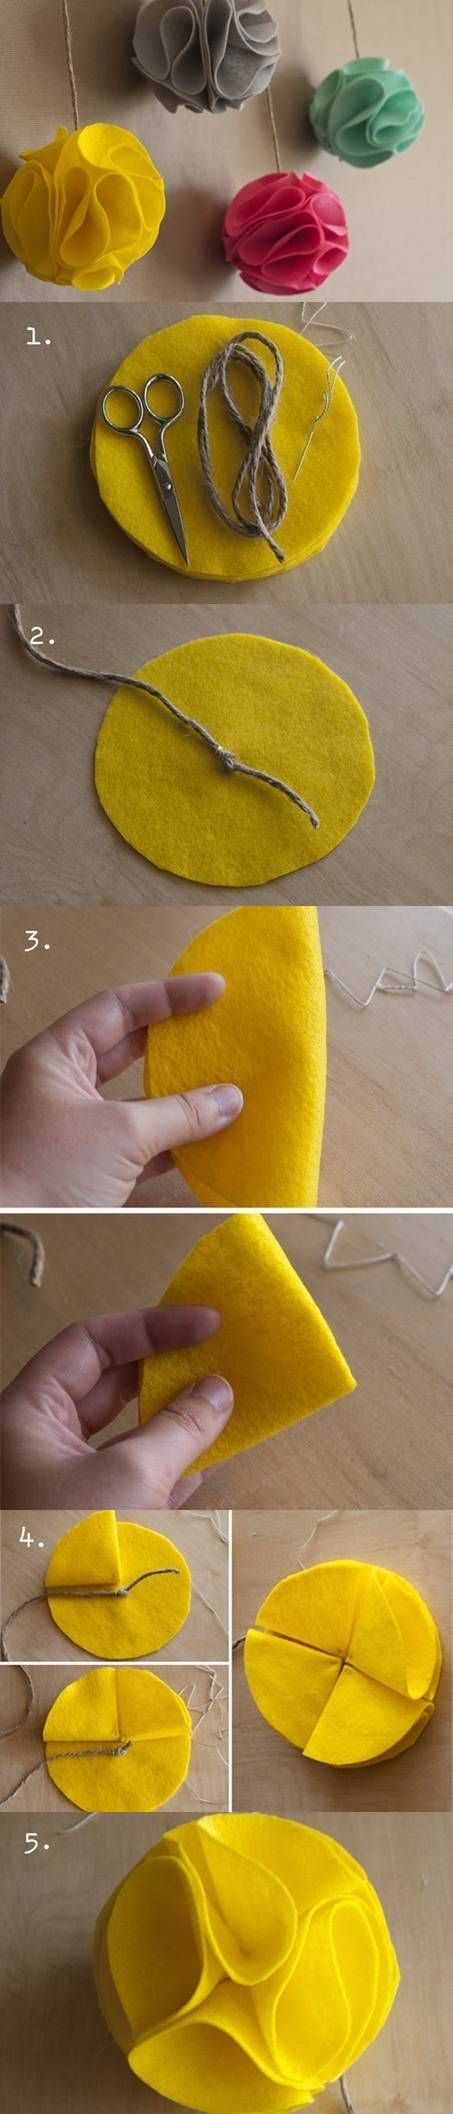 DIY: DIY Home and Crafts: DIY Felt Decorative Balls DIY Projects |... - Socialbliss | iemo[イエモ] | リフォーム&インテリアまとめ情報